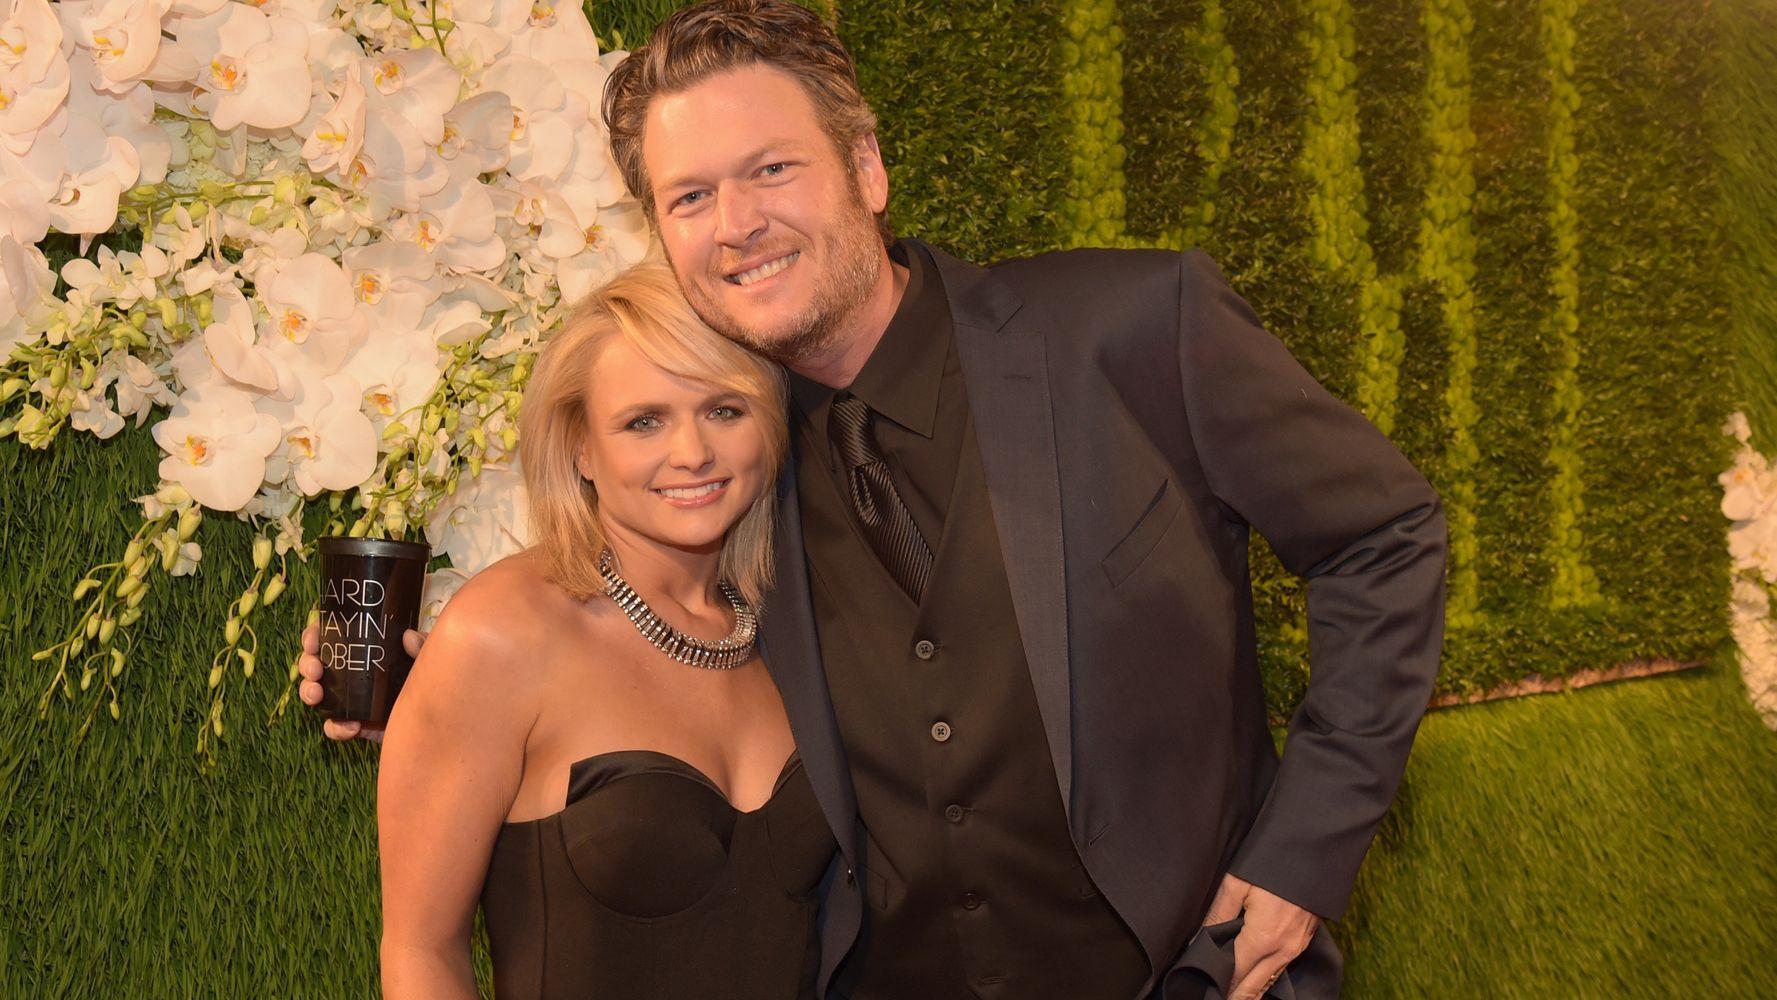 Blake Shelton And Miranda Lambert Split After 4 Years Of Marriage